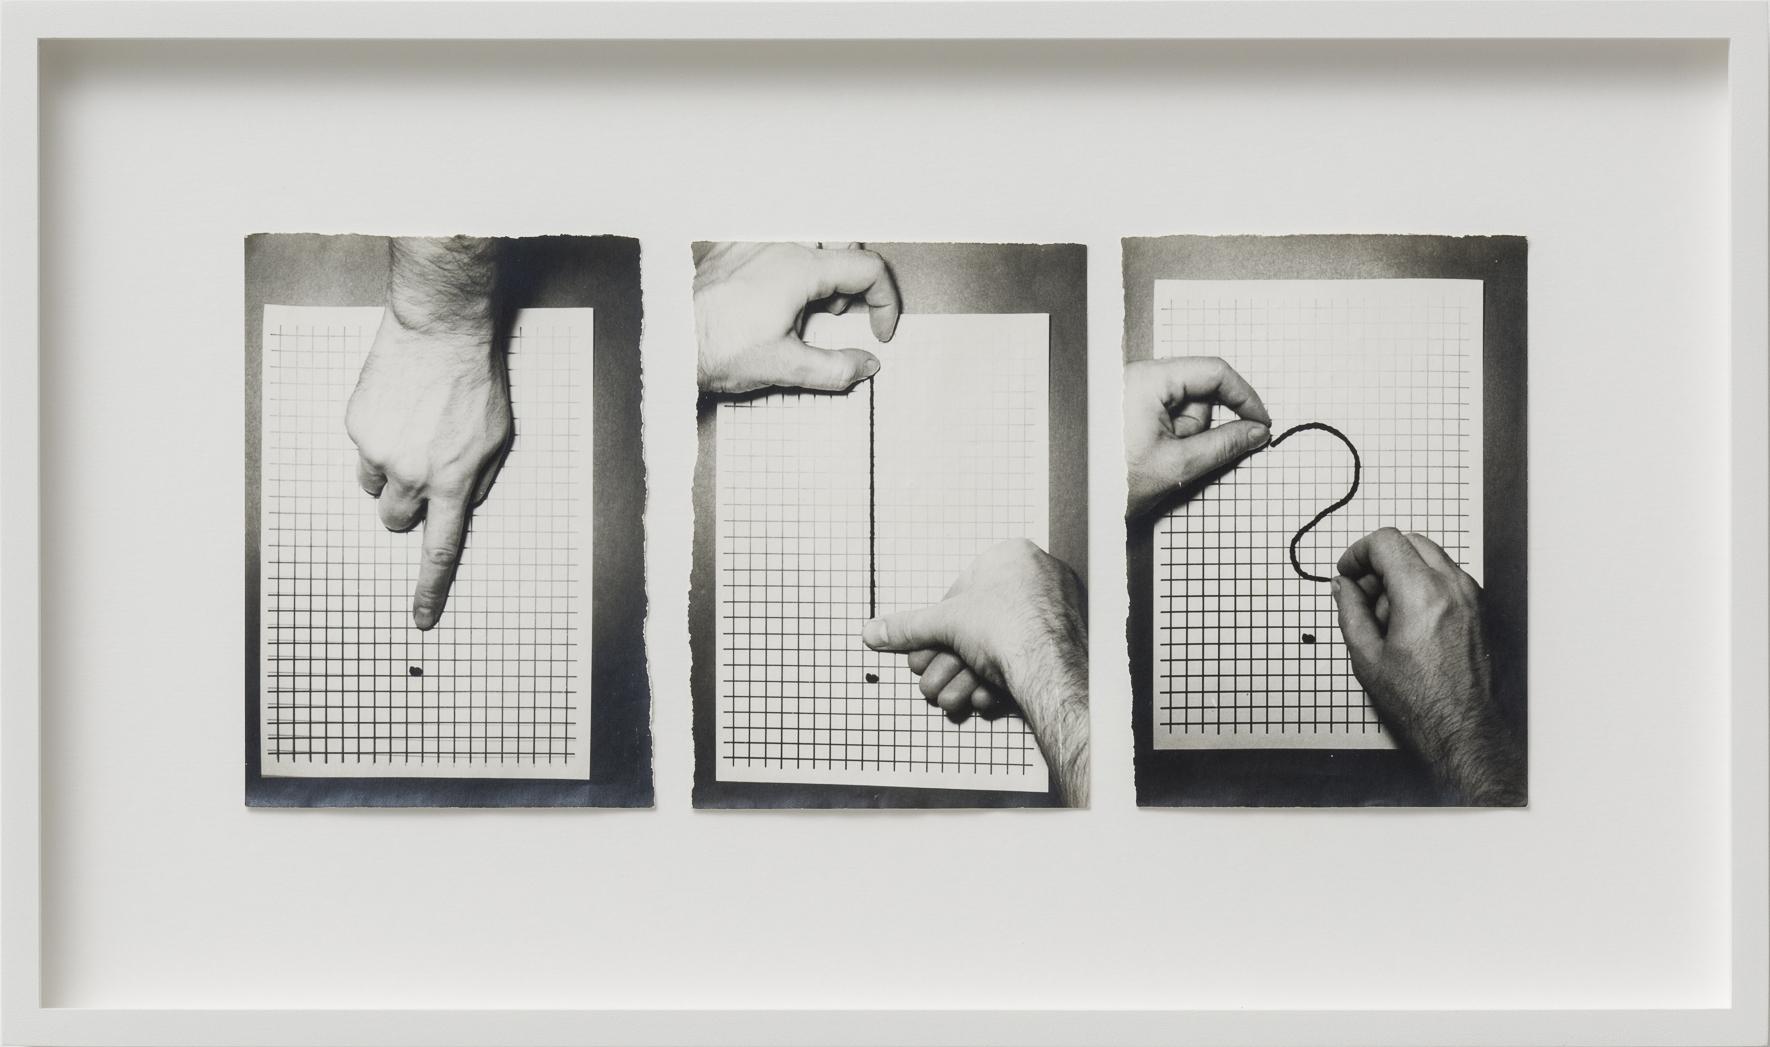 Ferenc Ficzek, Untitled I-III, 1976, series of 3 silver gelatin prints on Dokubrom paper, 27 x 45,5 cm (framed). Photo: Marcus Schneider